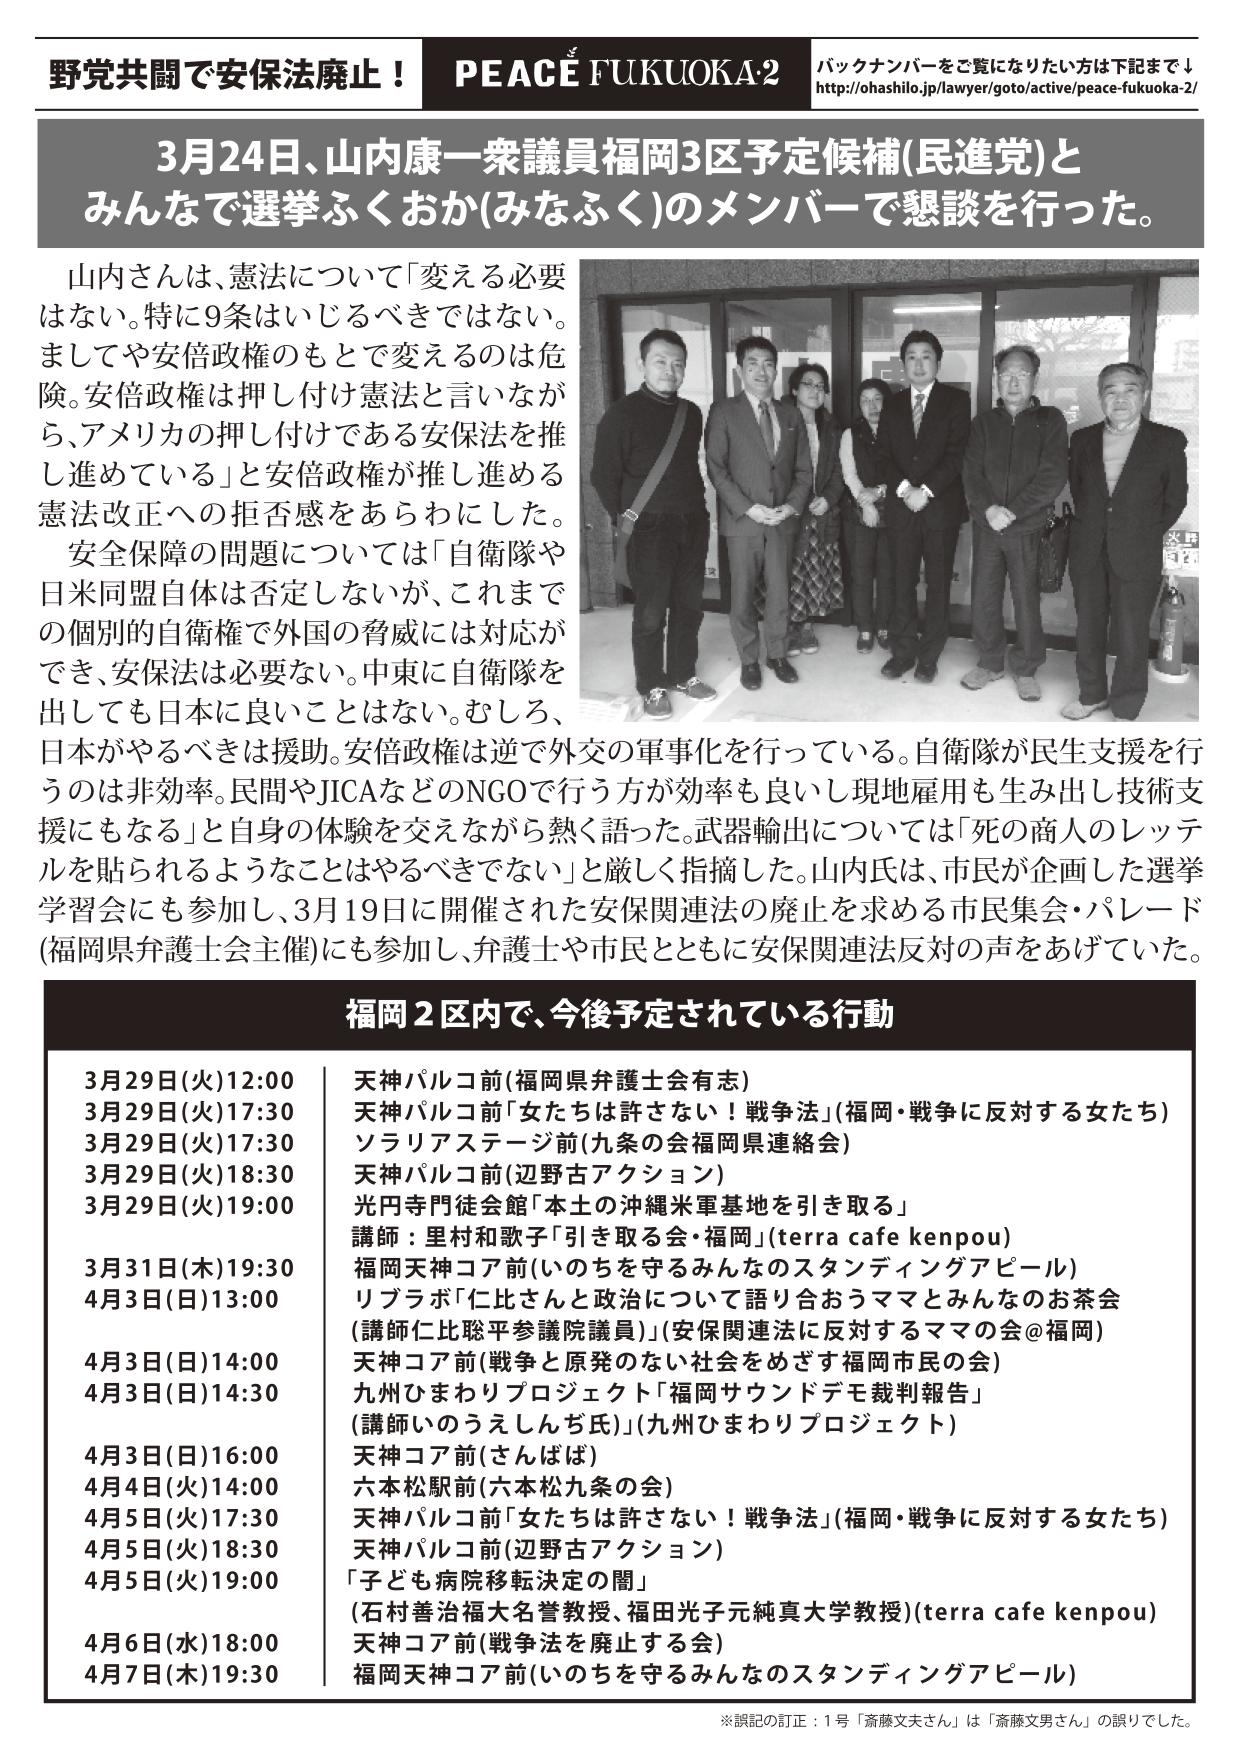 PF2 vol.2(裏)